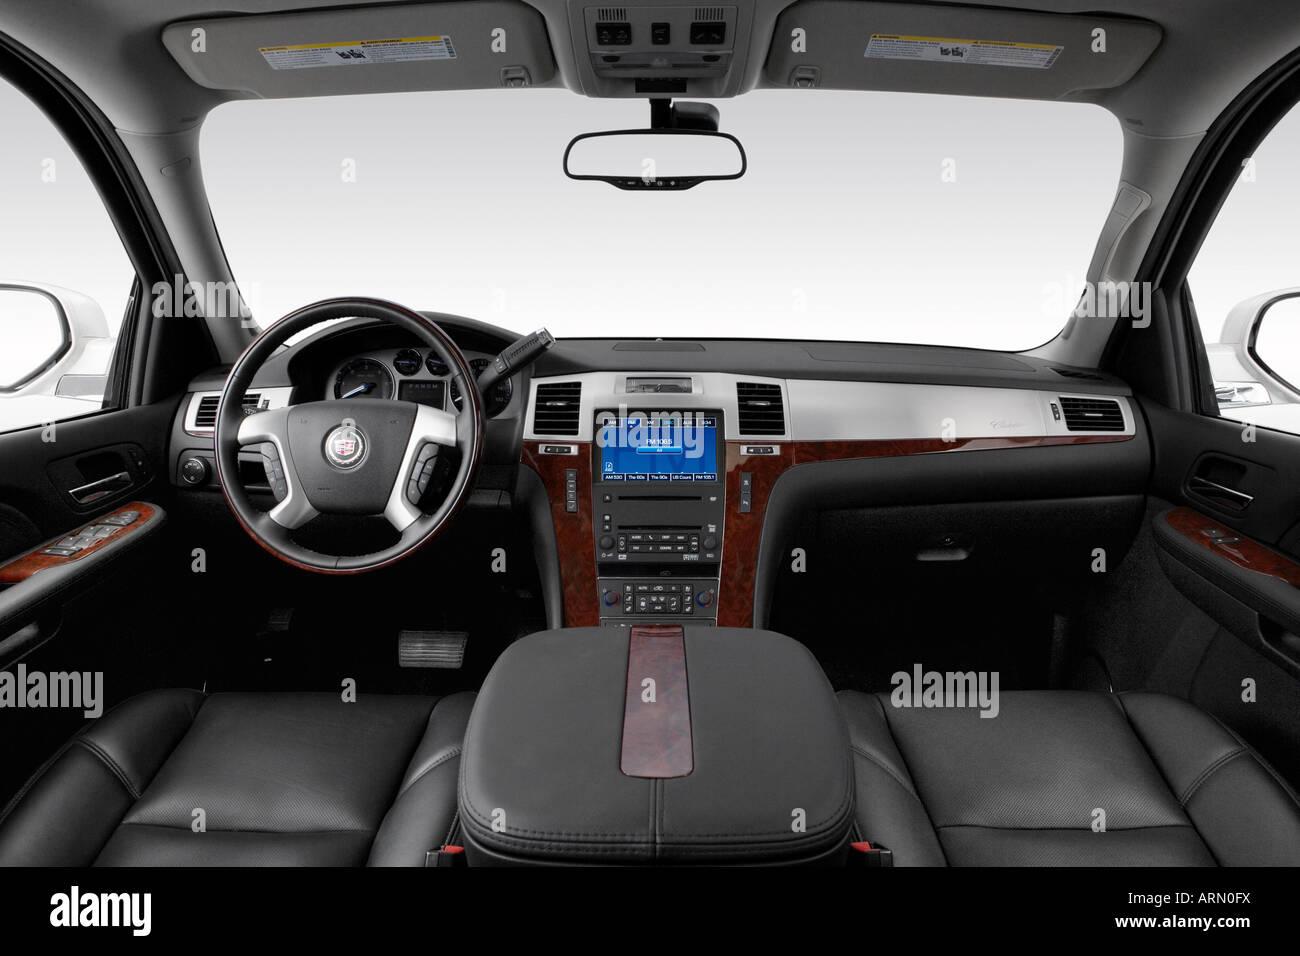 2008 cadillac escalade esv in white dashboard center console gear shifter view